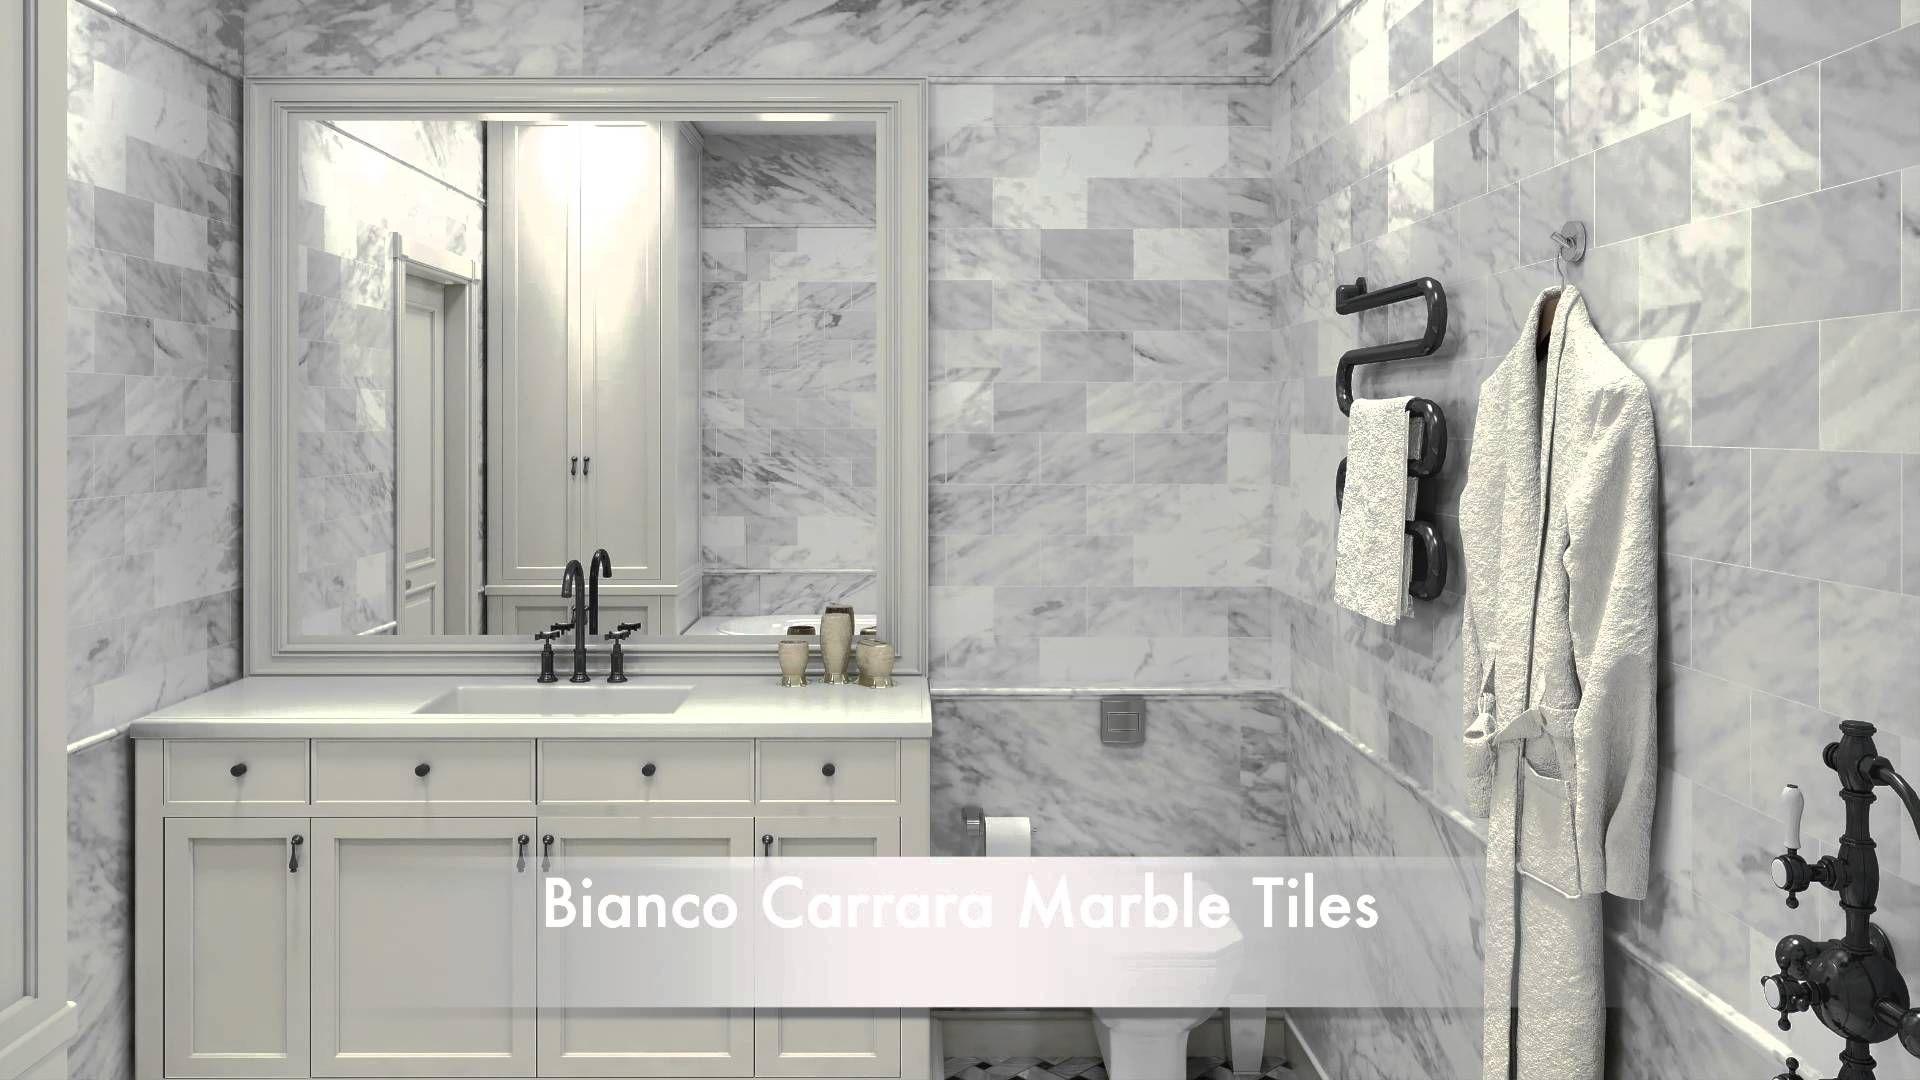 Bathroom Tile Ideas White Carrara Marble Tiles And Calacatta Gold Marble